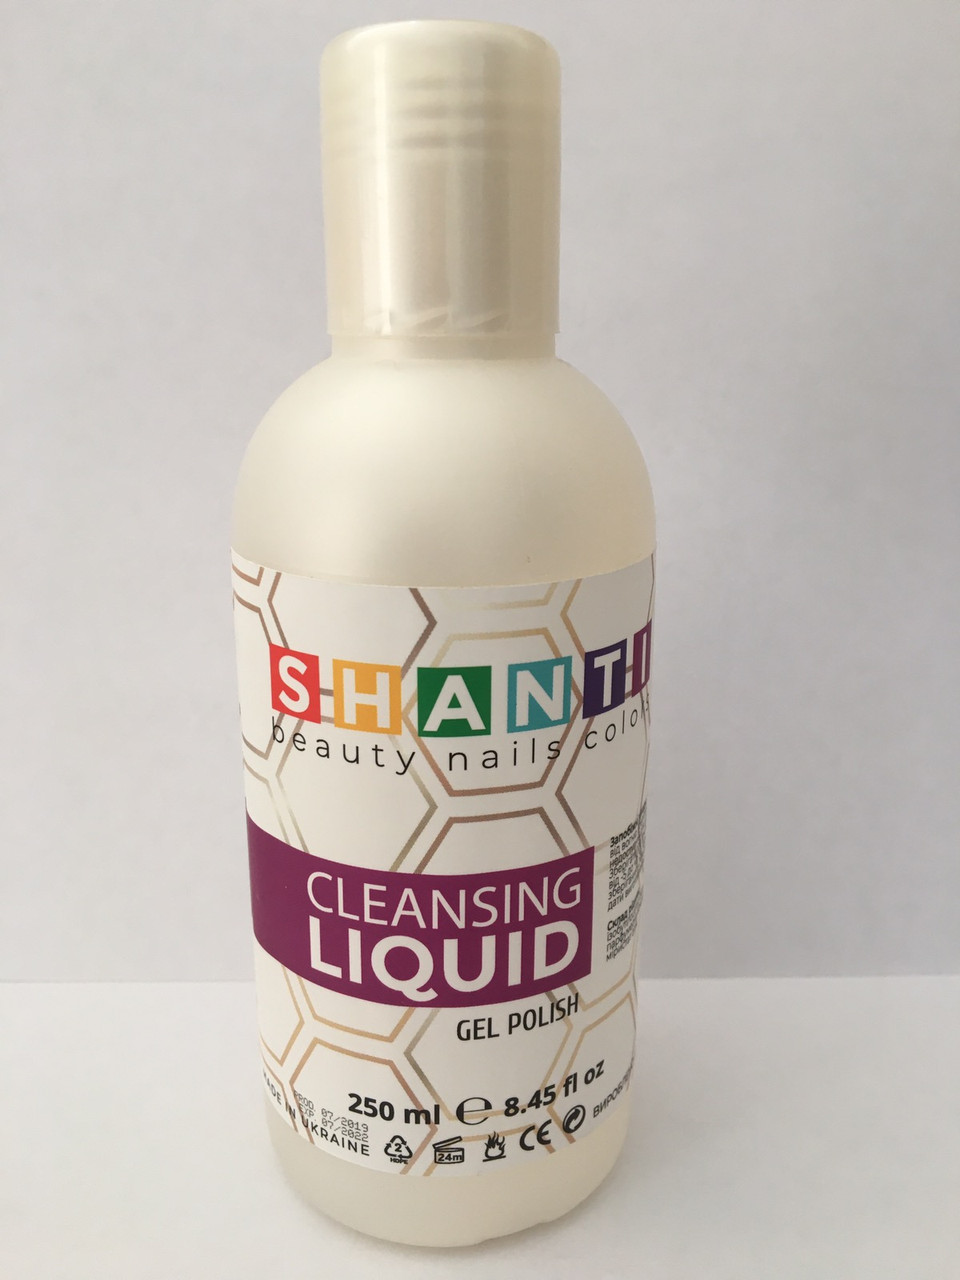 Ремувер для зняття гель-лаку SHANTI CLEANSING LIQUID 250